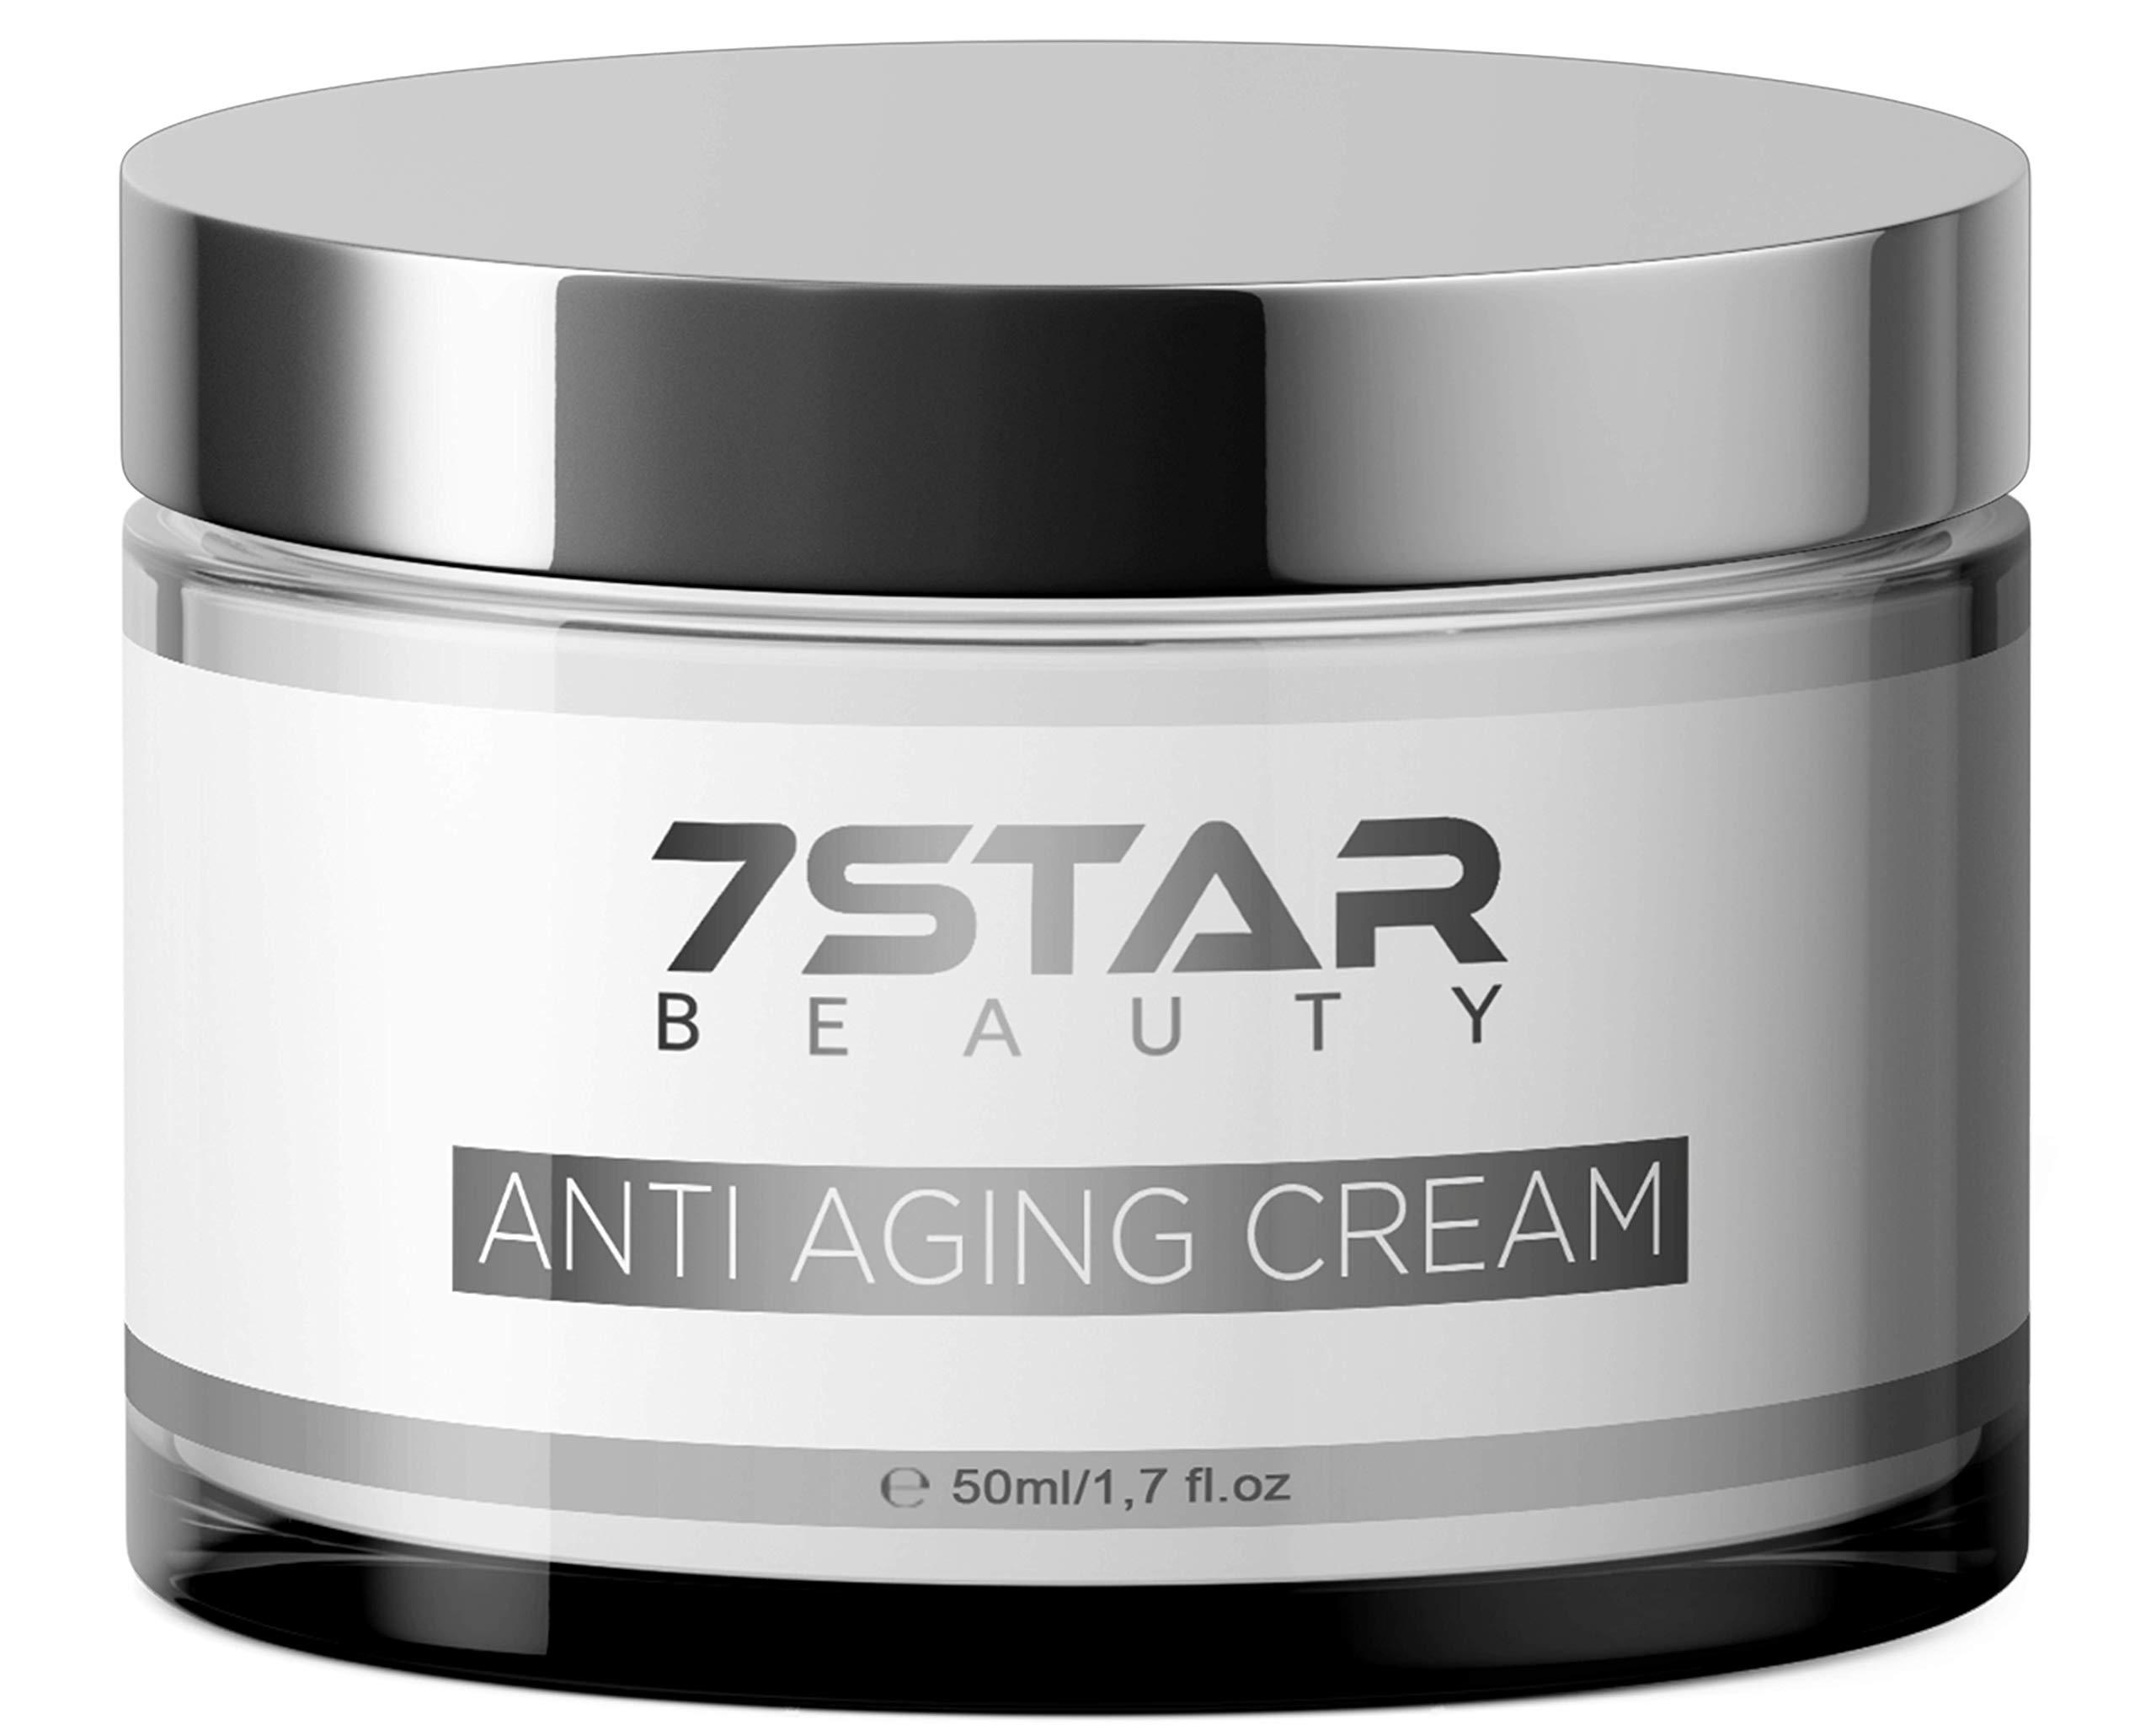 cb2adff37497 Am besten bewertete Produkte in der Kategorie Beauty - Amazon.de